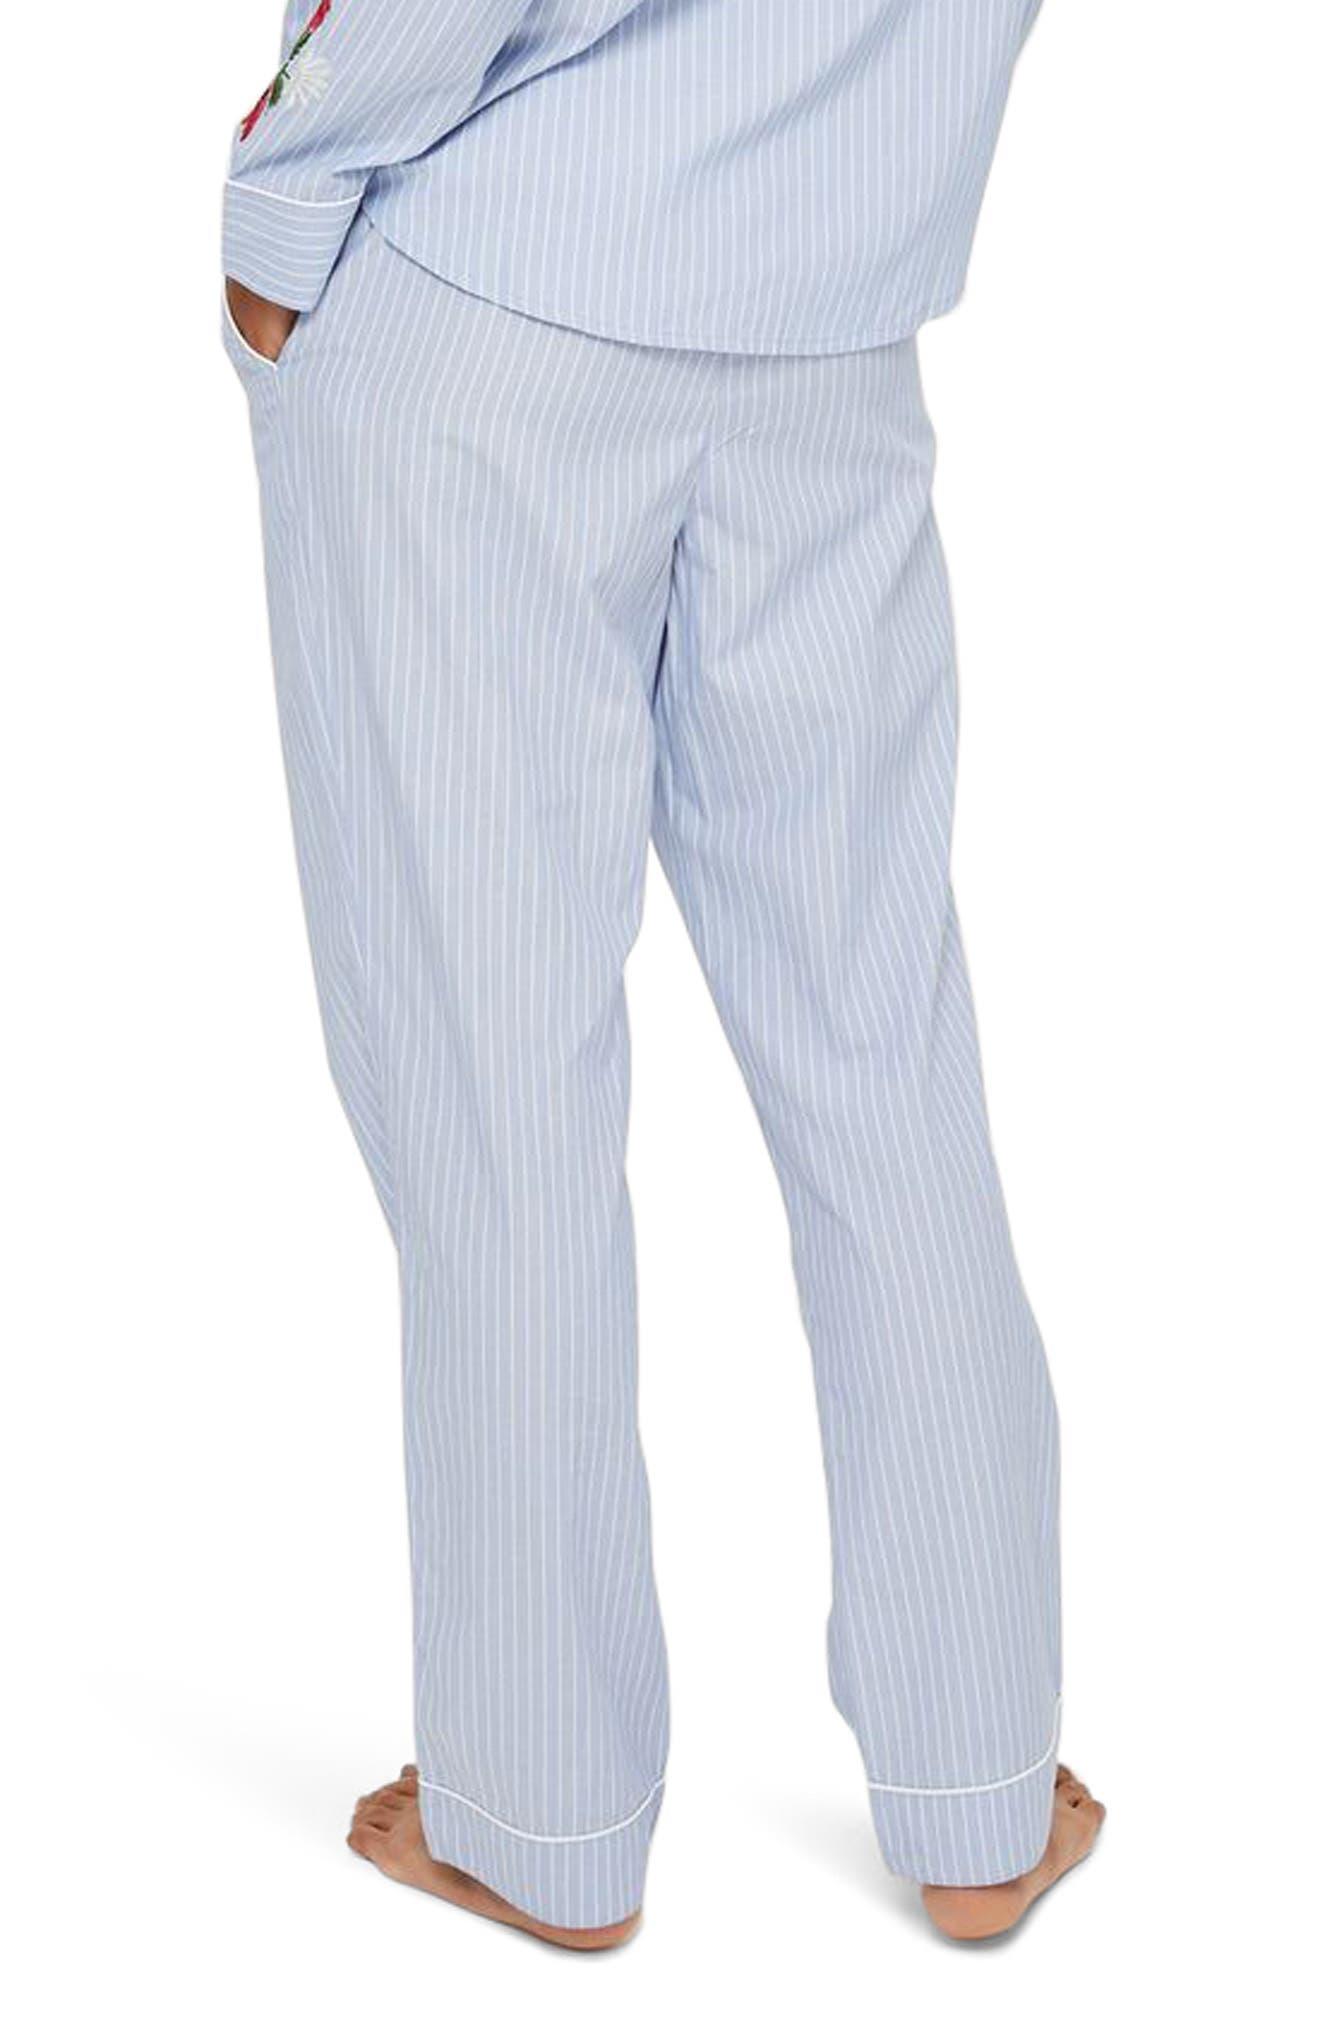 Floral Embroidered Stripe Pajama Pants,                             Alternate thumbnail 2, color,                             Blue Multi